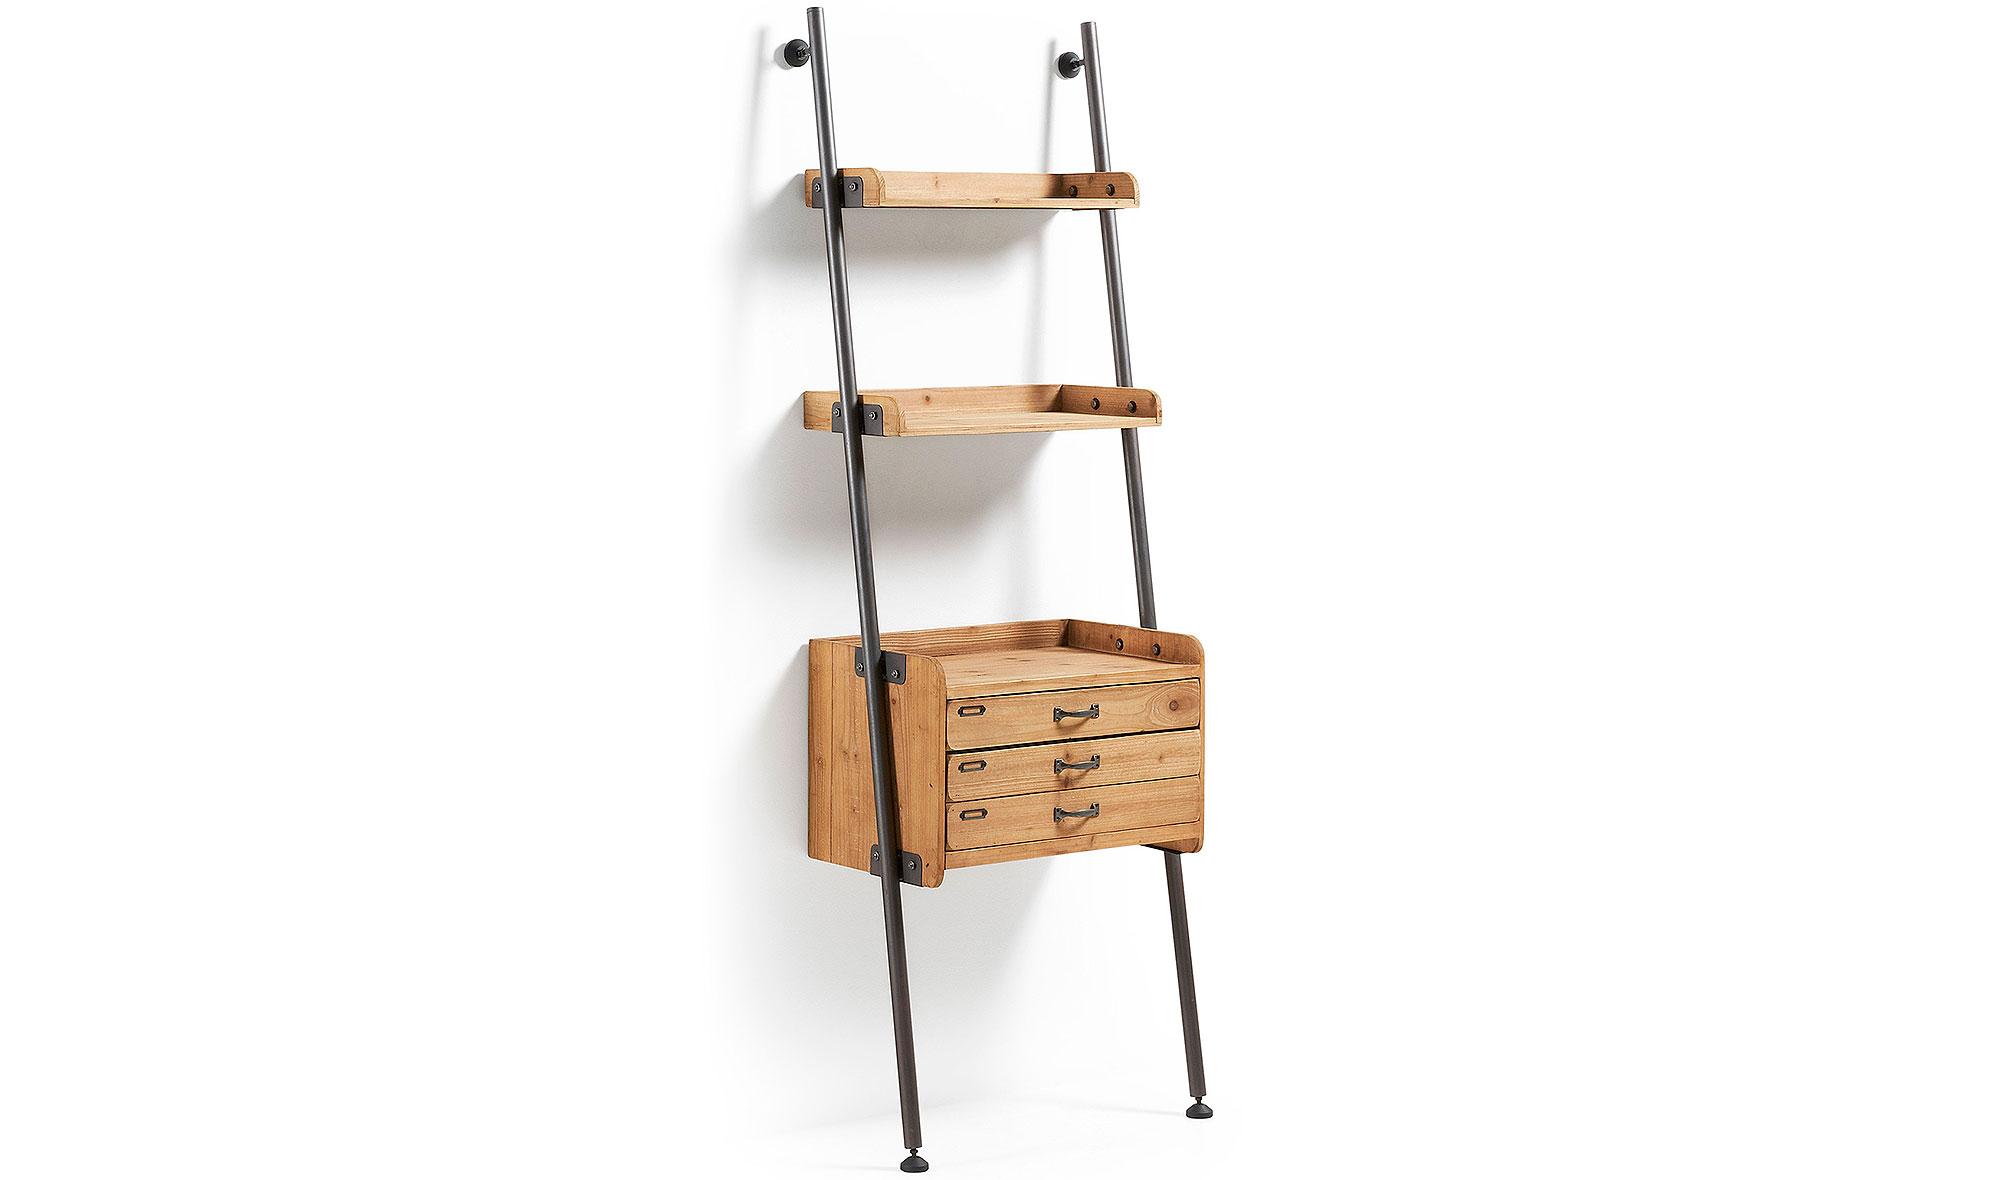 estantera industrial con cajones mobela - Estanterias Estrechas